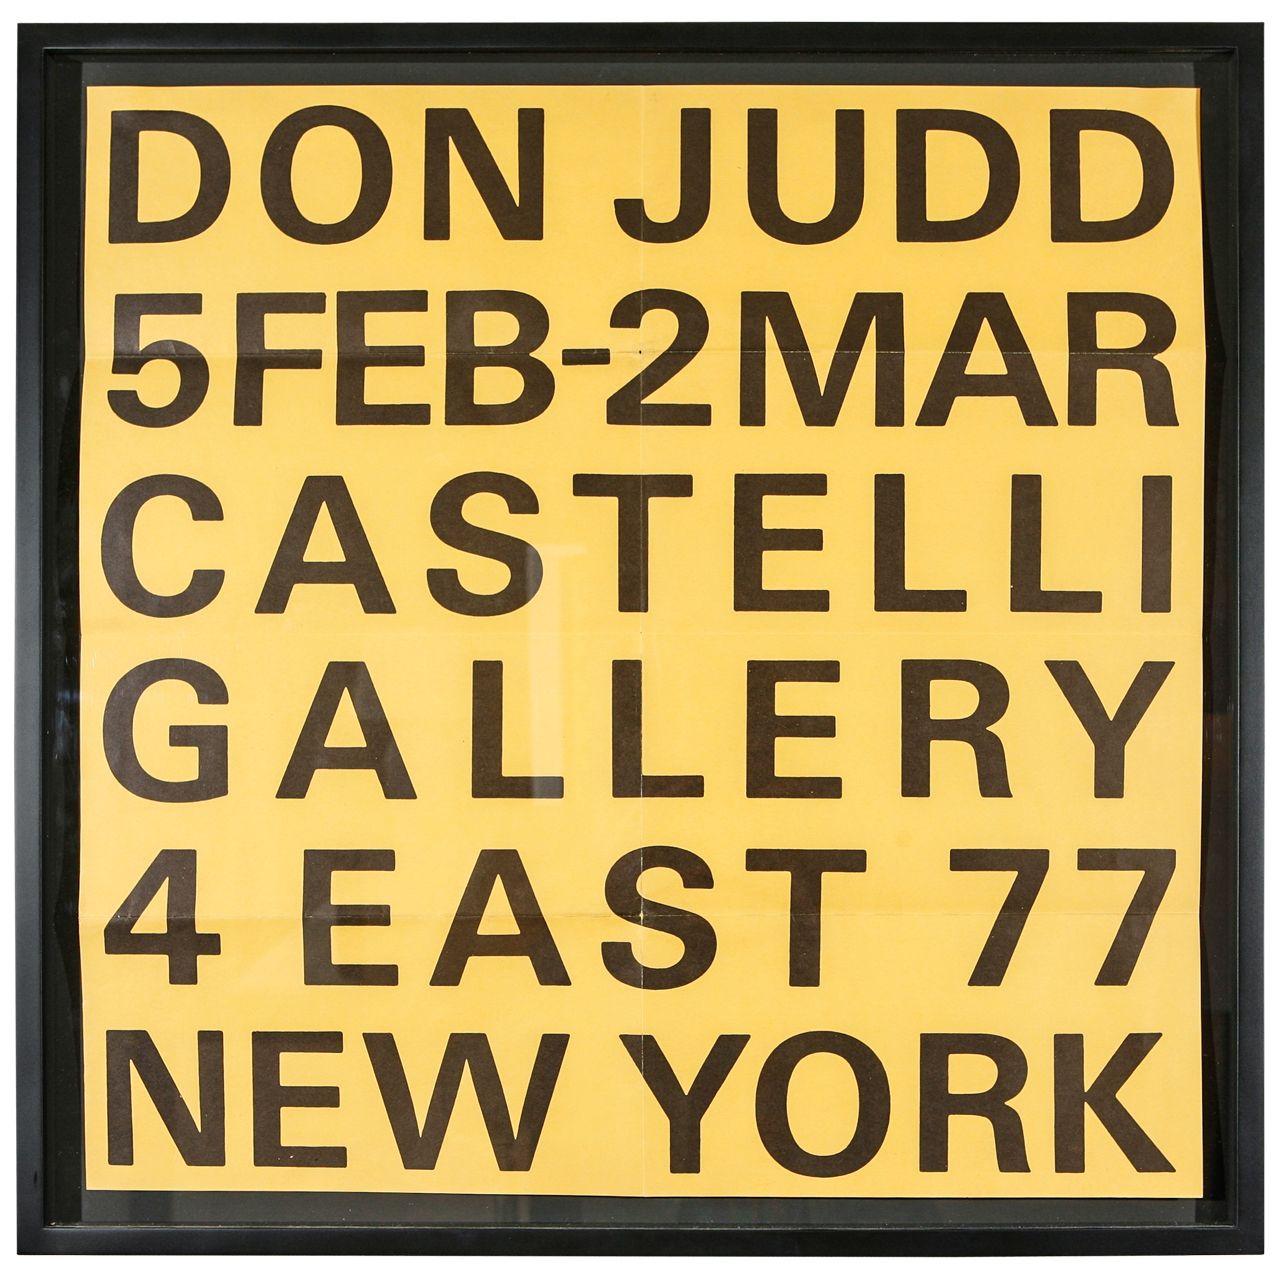 Rare Original Donald Judd Lithograph Announcing Exhibition- 1966 ...